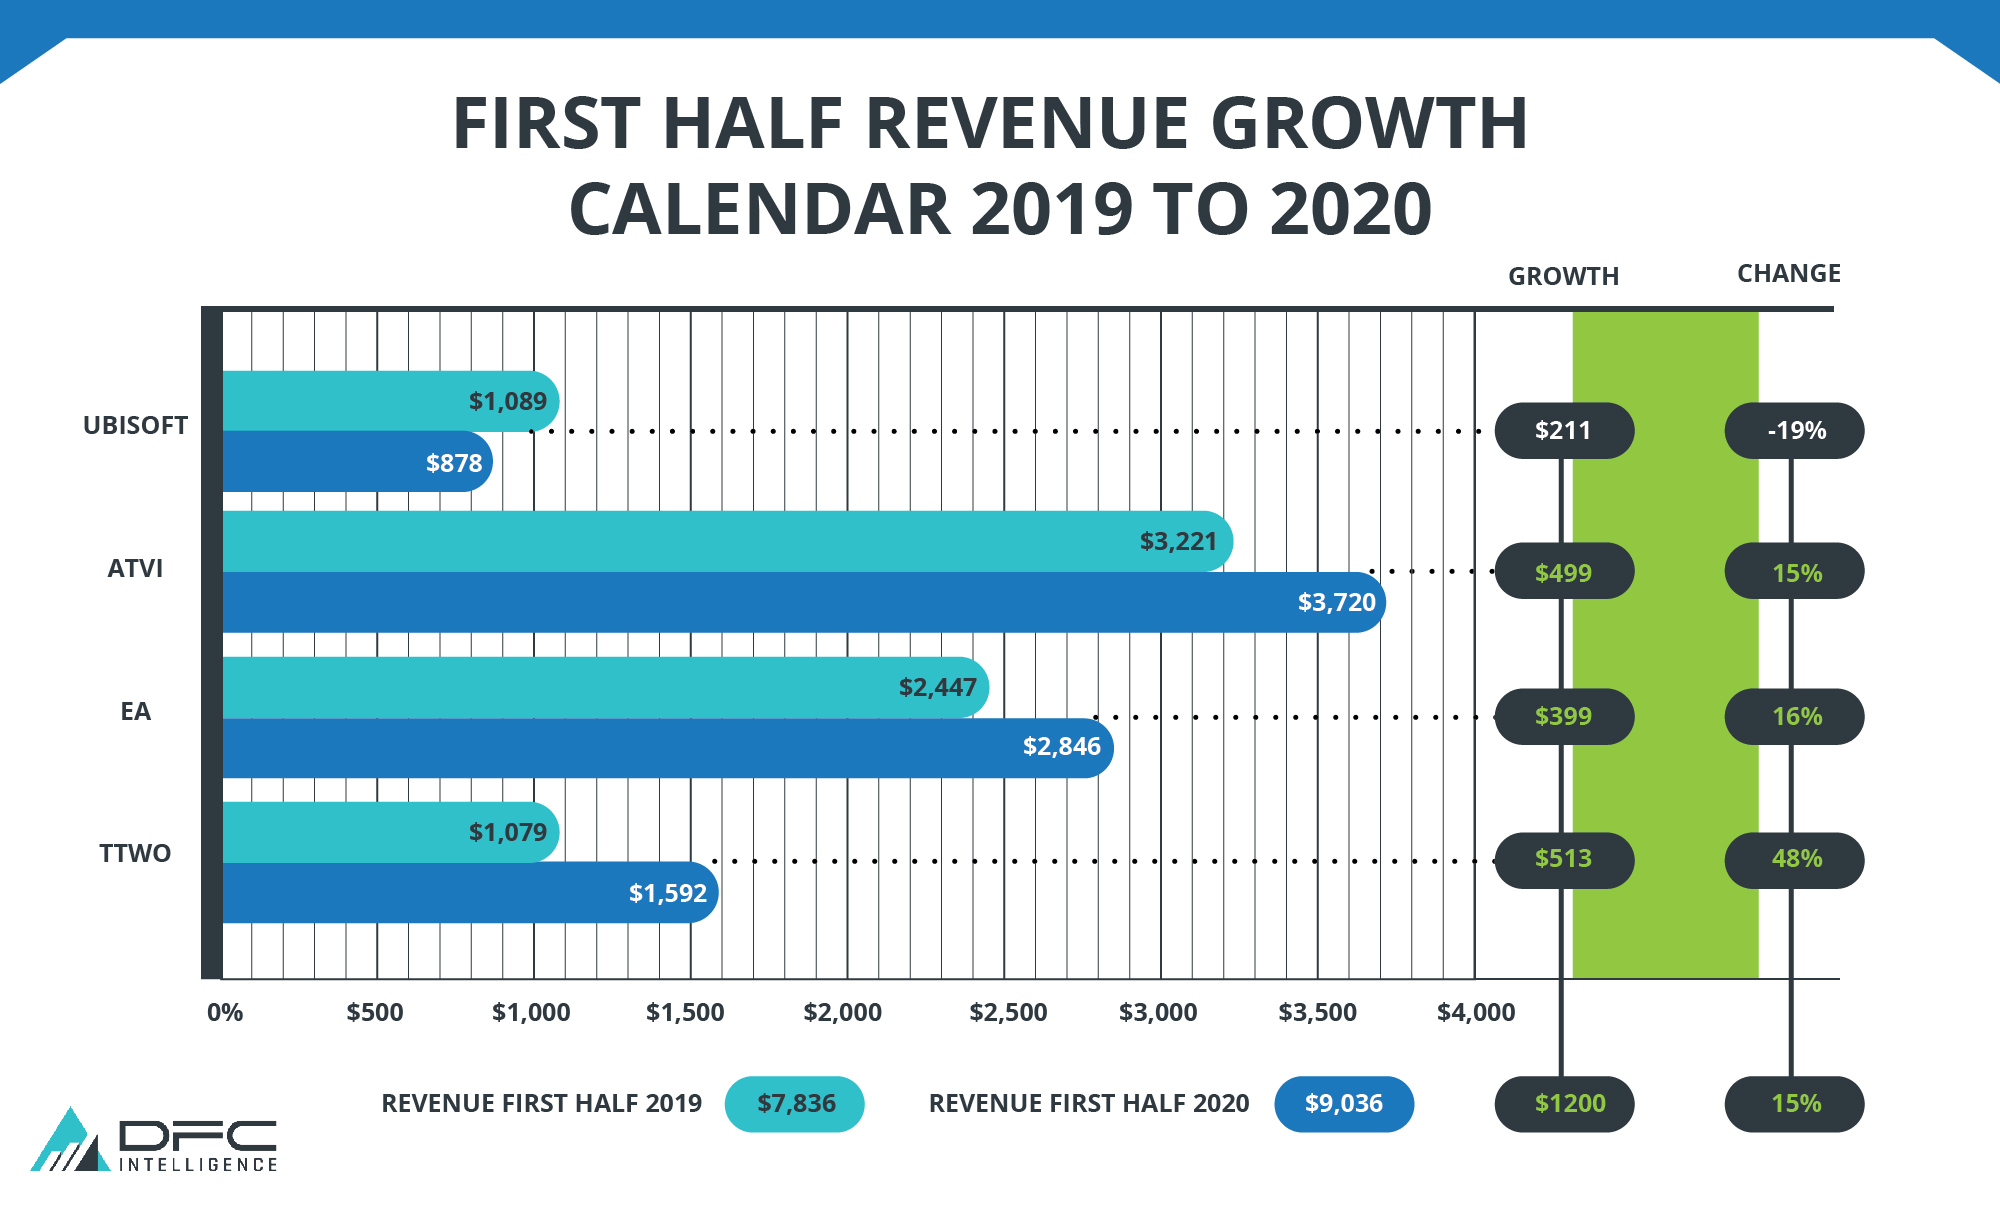 First Half Revenue Growth Calendar 2019 to 2020